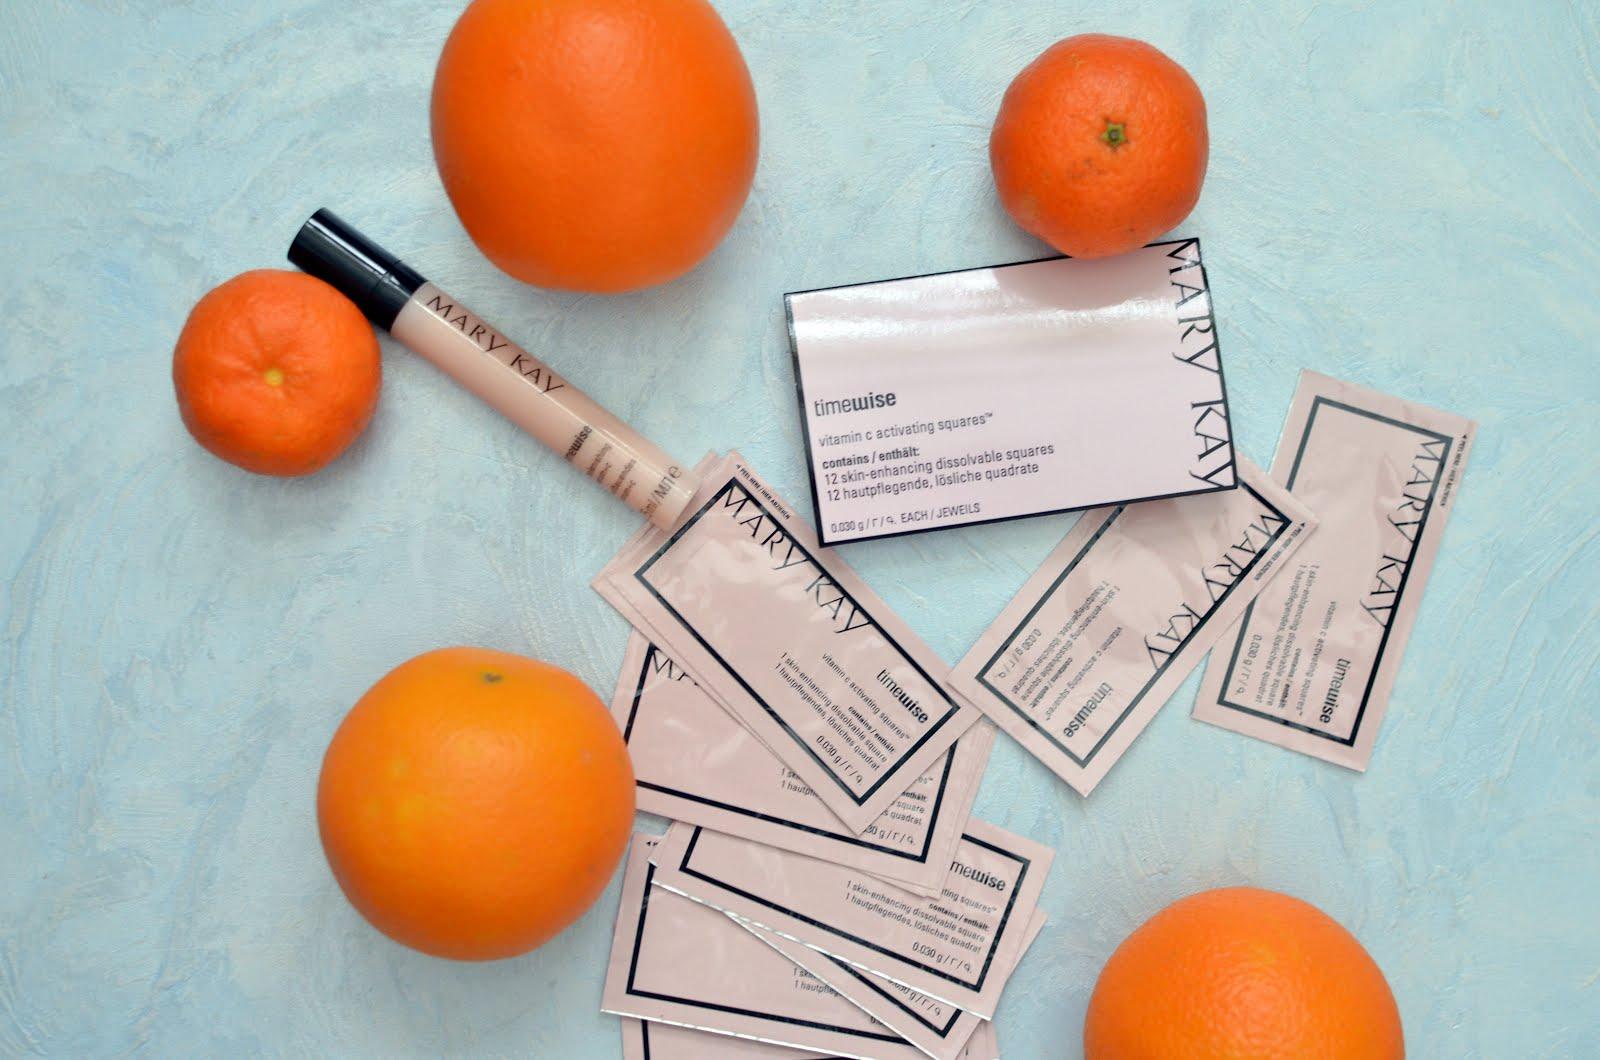 Марафон MARY KAY. TimeWise Vitamin C Activating Squares Растворимые полоски с витамином С